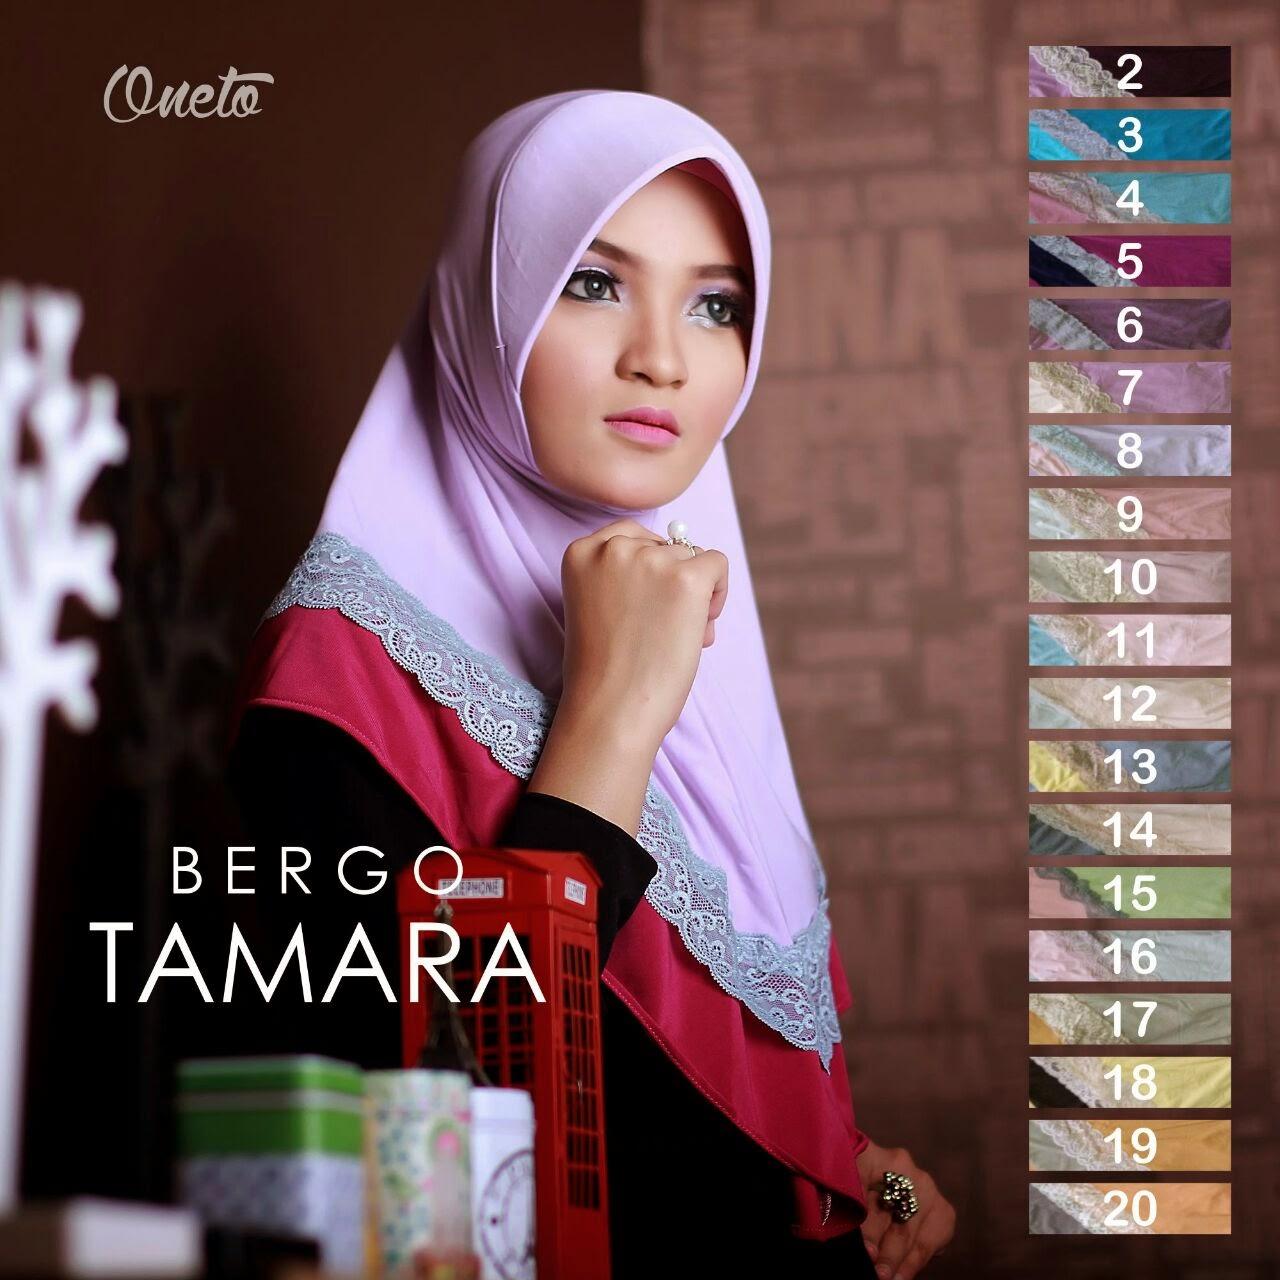 Jilbab oneto terbaru supplier jilbab branded original Baju gamis almia terbaru